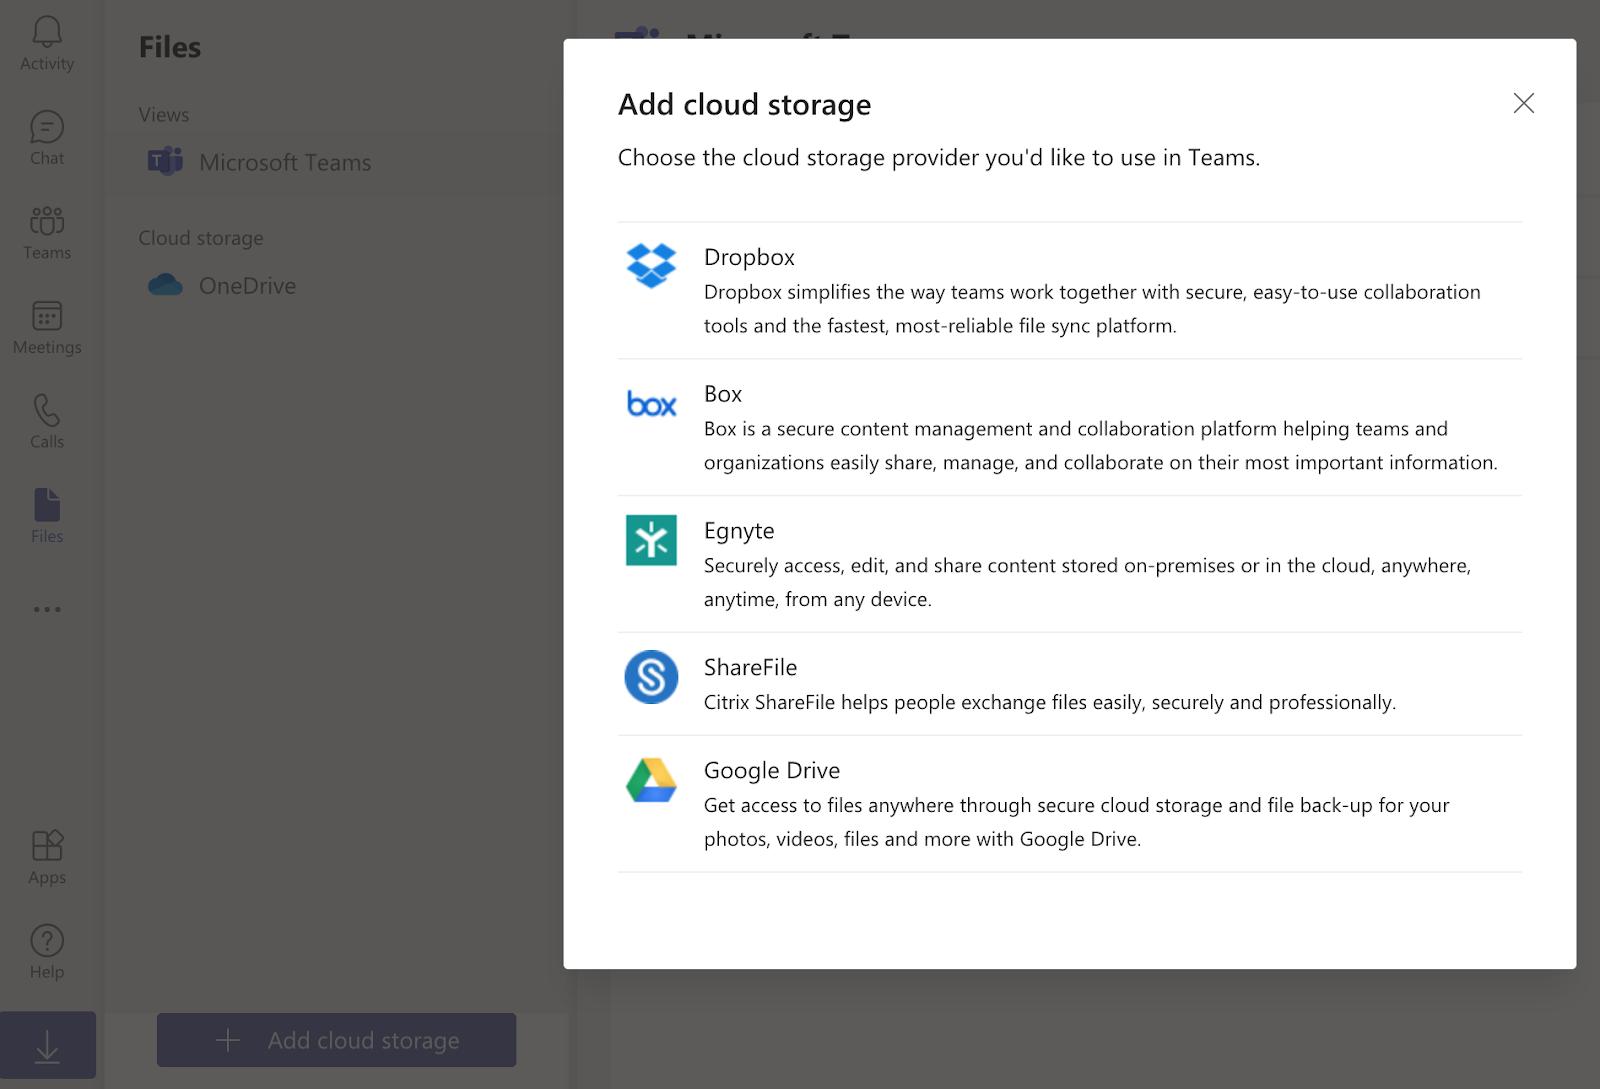 Adding cloud storage to Microsoft Teams